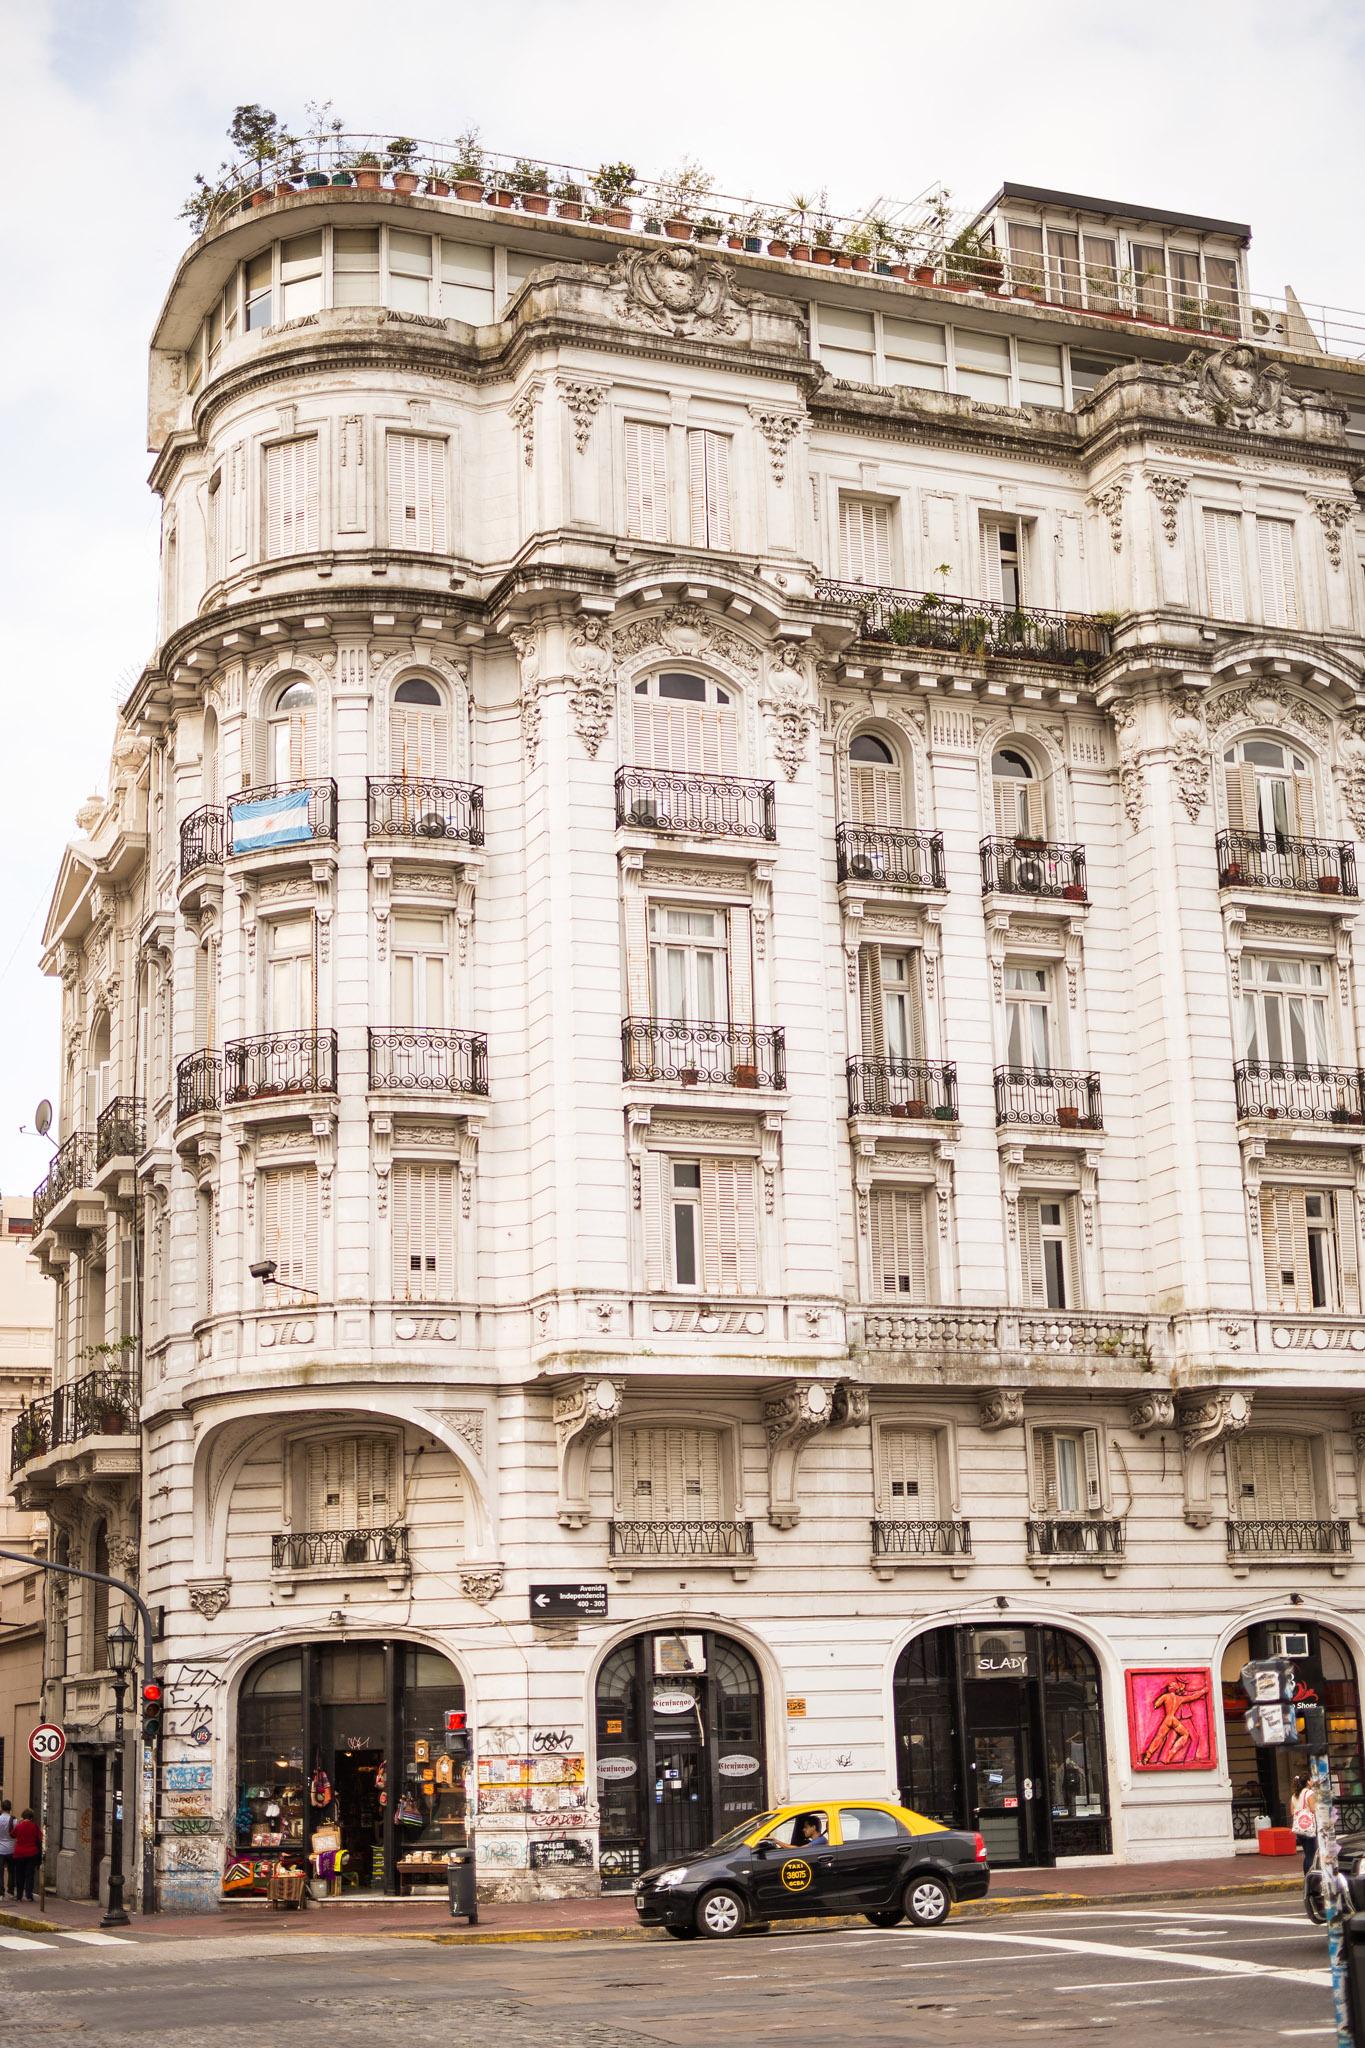 wedding-travellers-argentina-buenos-aires-san-telmo-tango-building-architecture